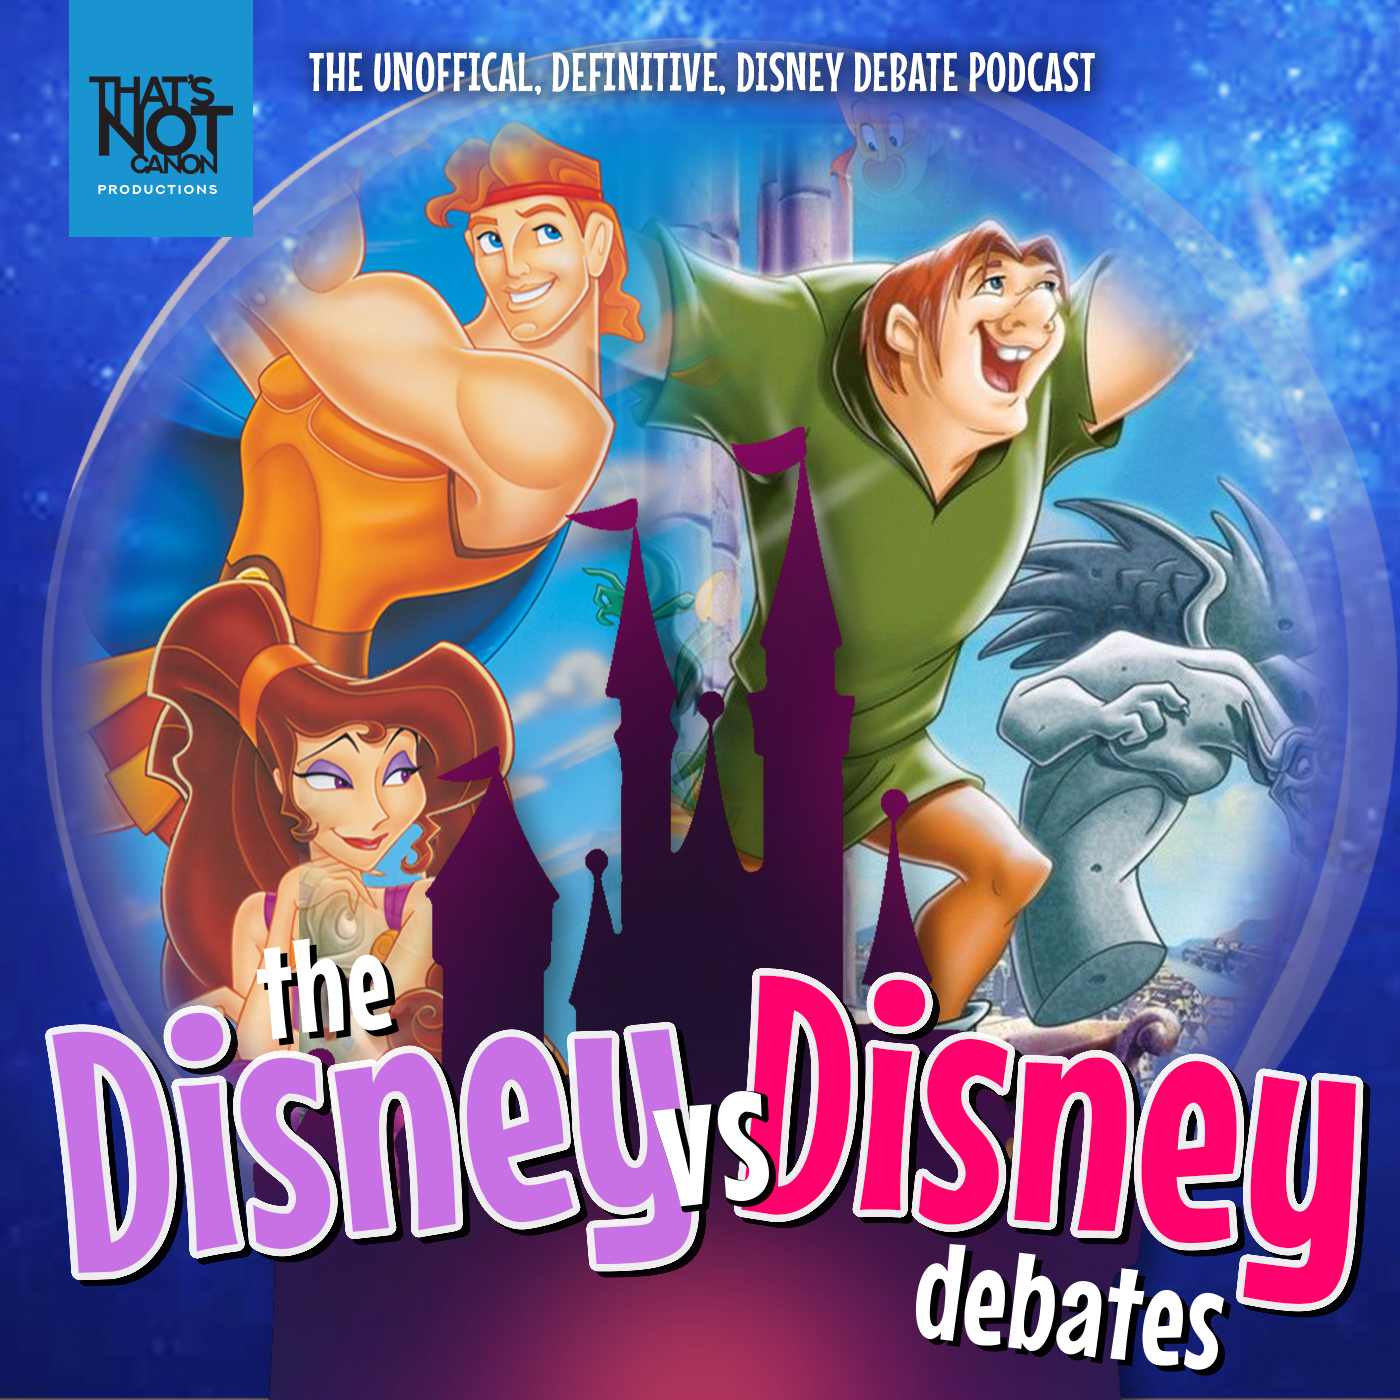 DvD-LOGO Episode Art 25 Hercules vs The Hunchback of Notre Dame.png